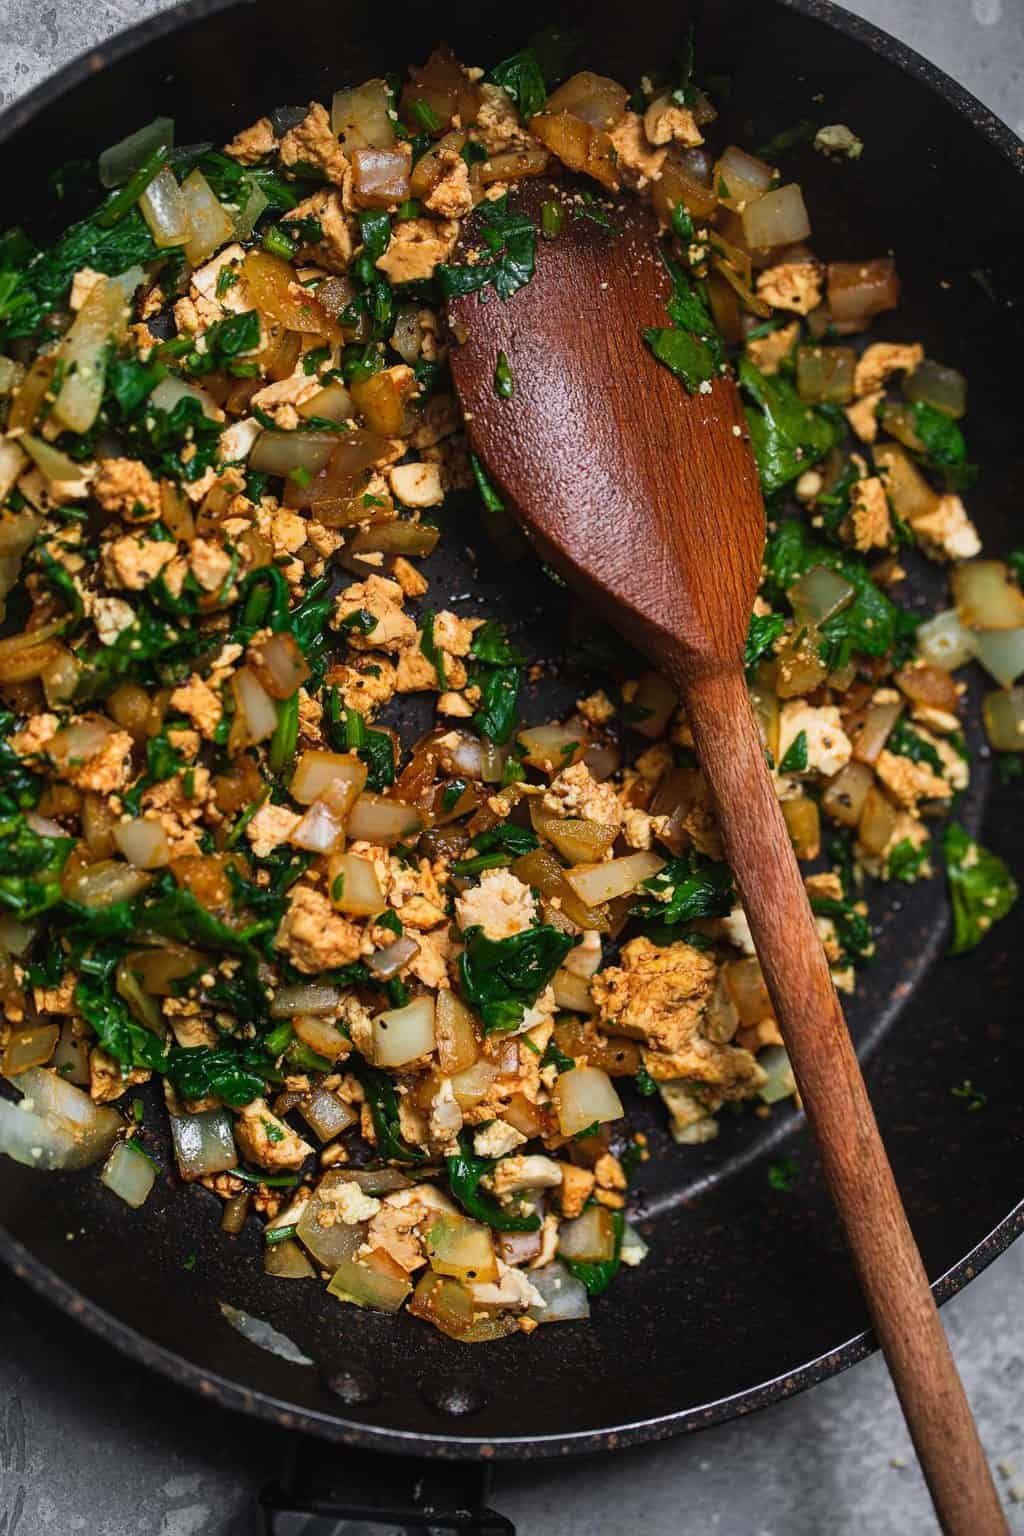 Tofu and spinach ravioli filling